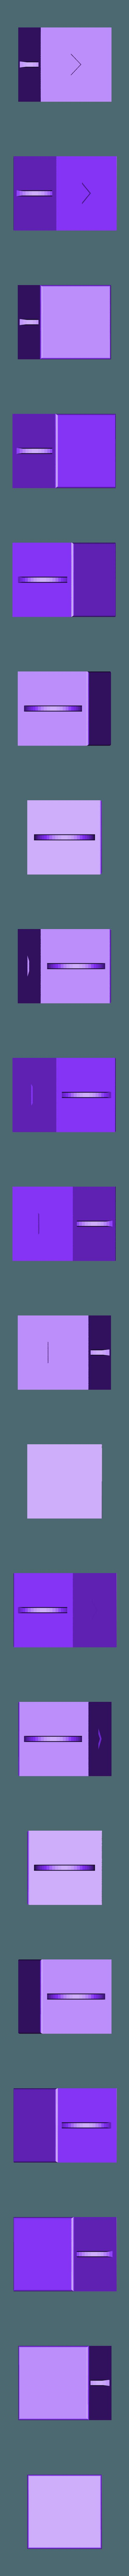 PennyPixelBlockArtStandard.stl Download free STL file 3D Penny-Powered Pixel Art Blocks - Video Game Art • Model to 3D print, tonyyoungblood